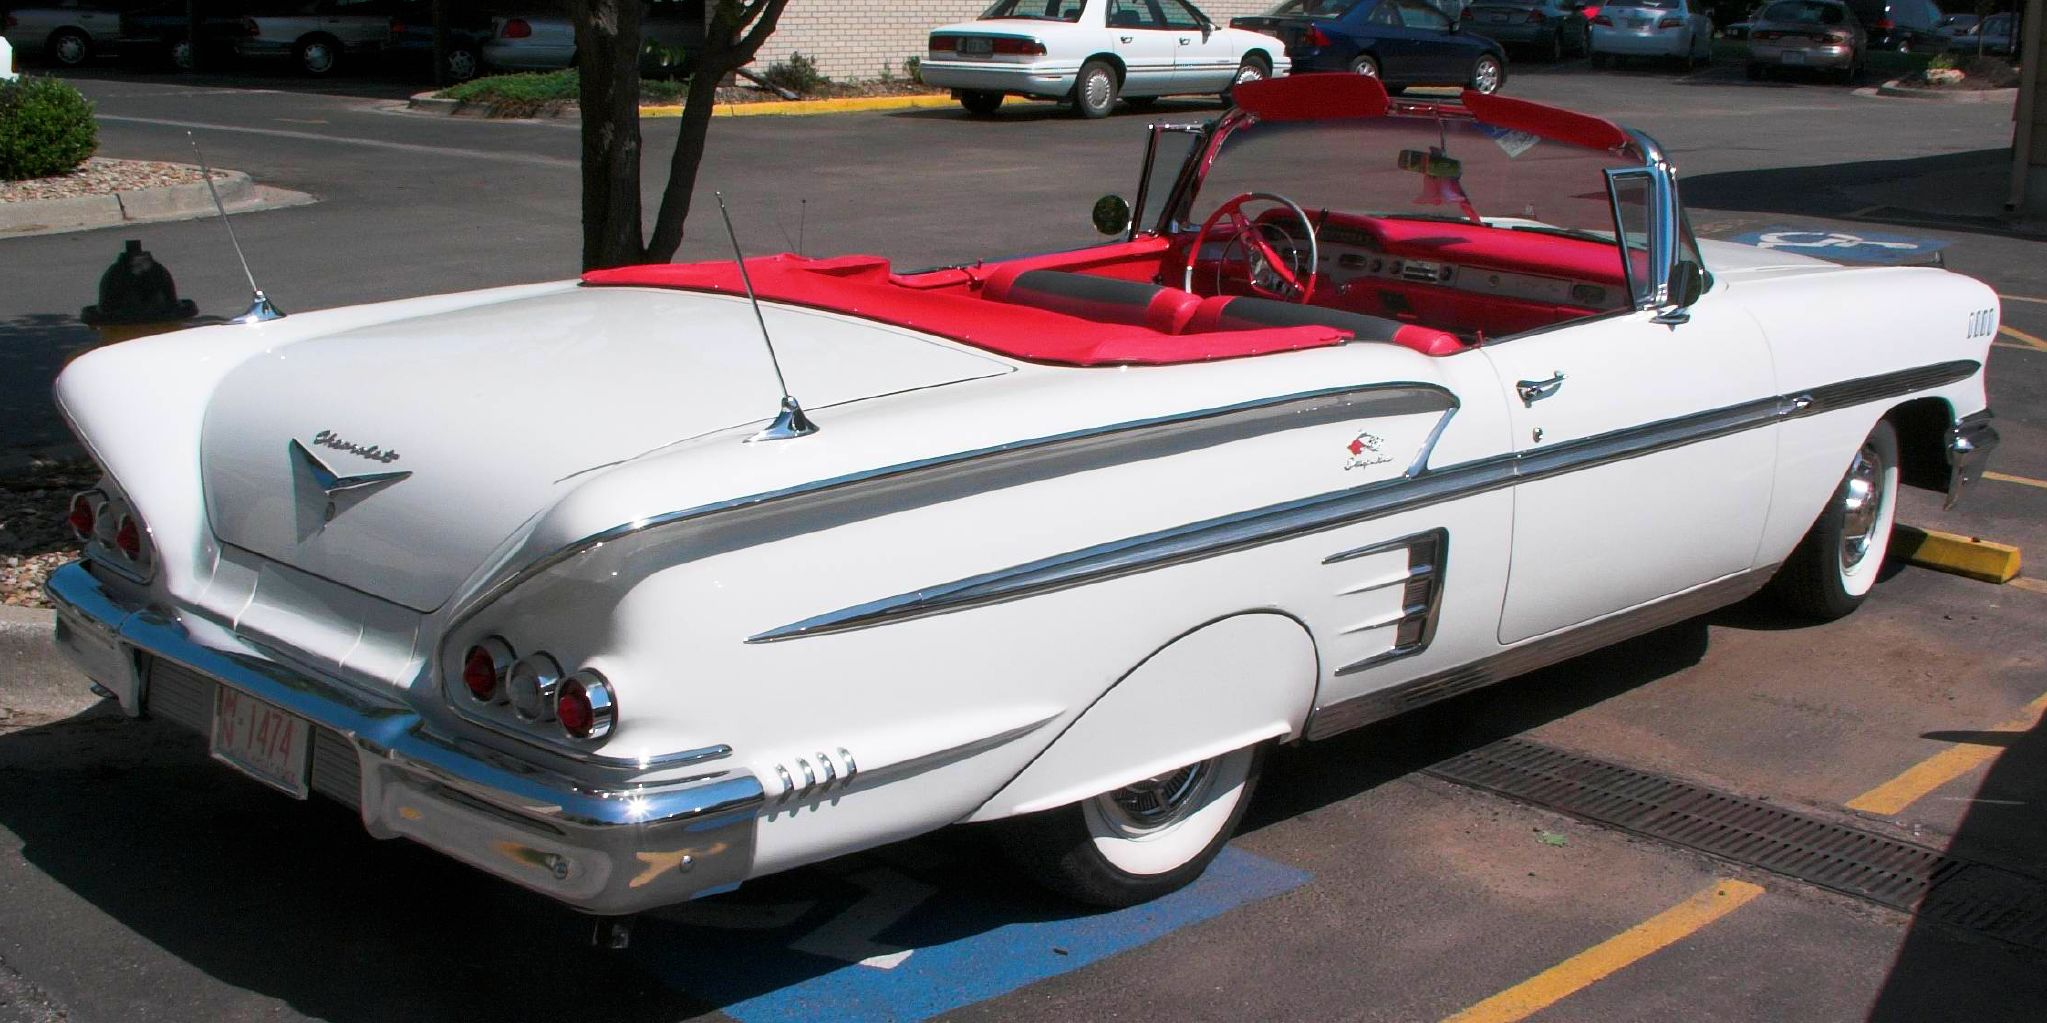 1960 chevy impala convertible for sale joy studio design gallery best design. Black Bedroom Furniture Sets. Home Design Ideas